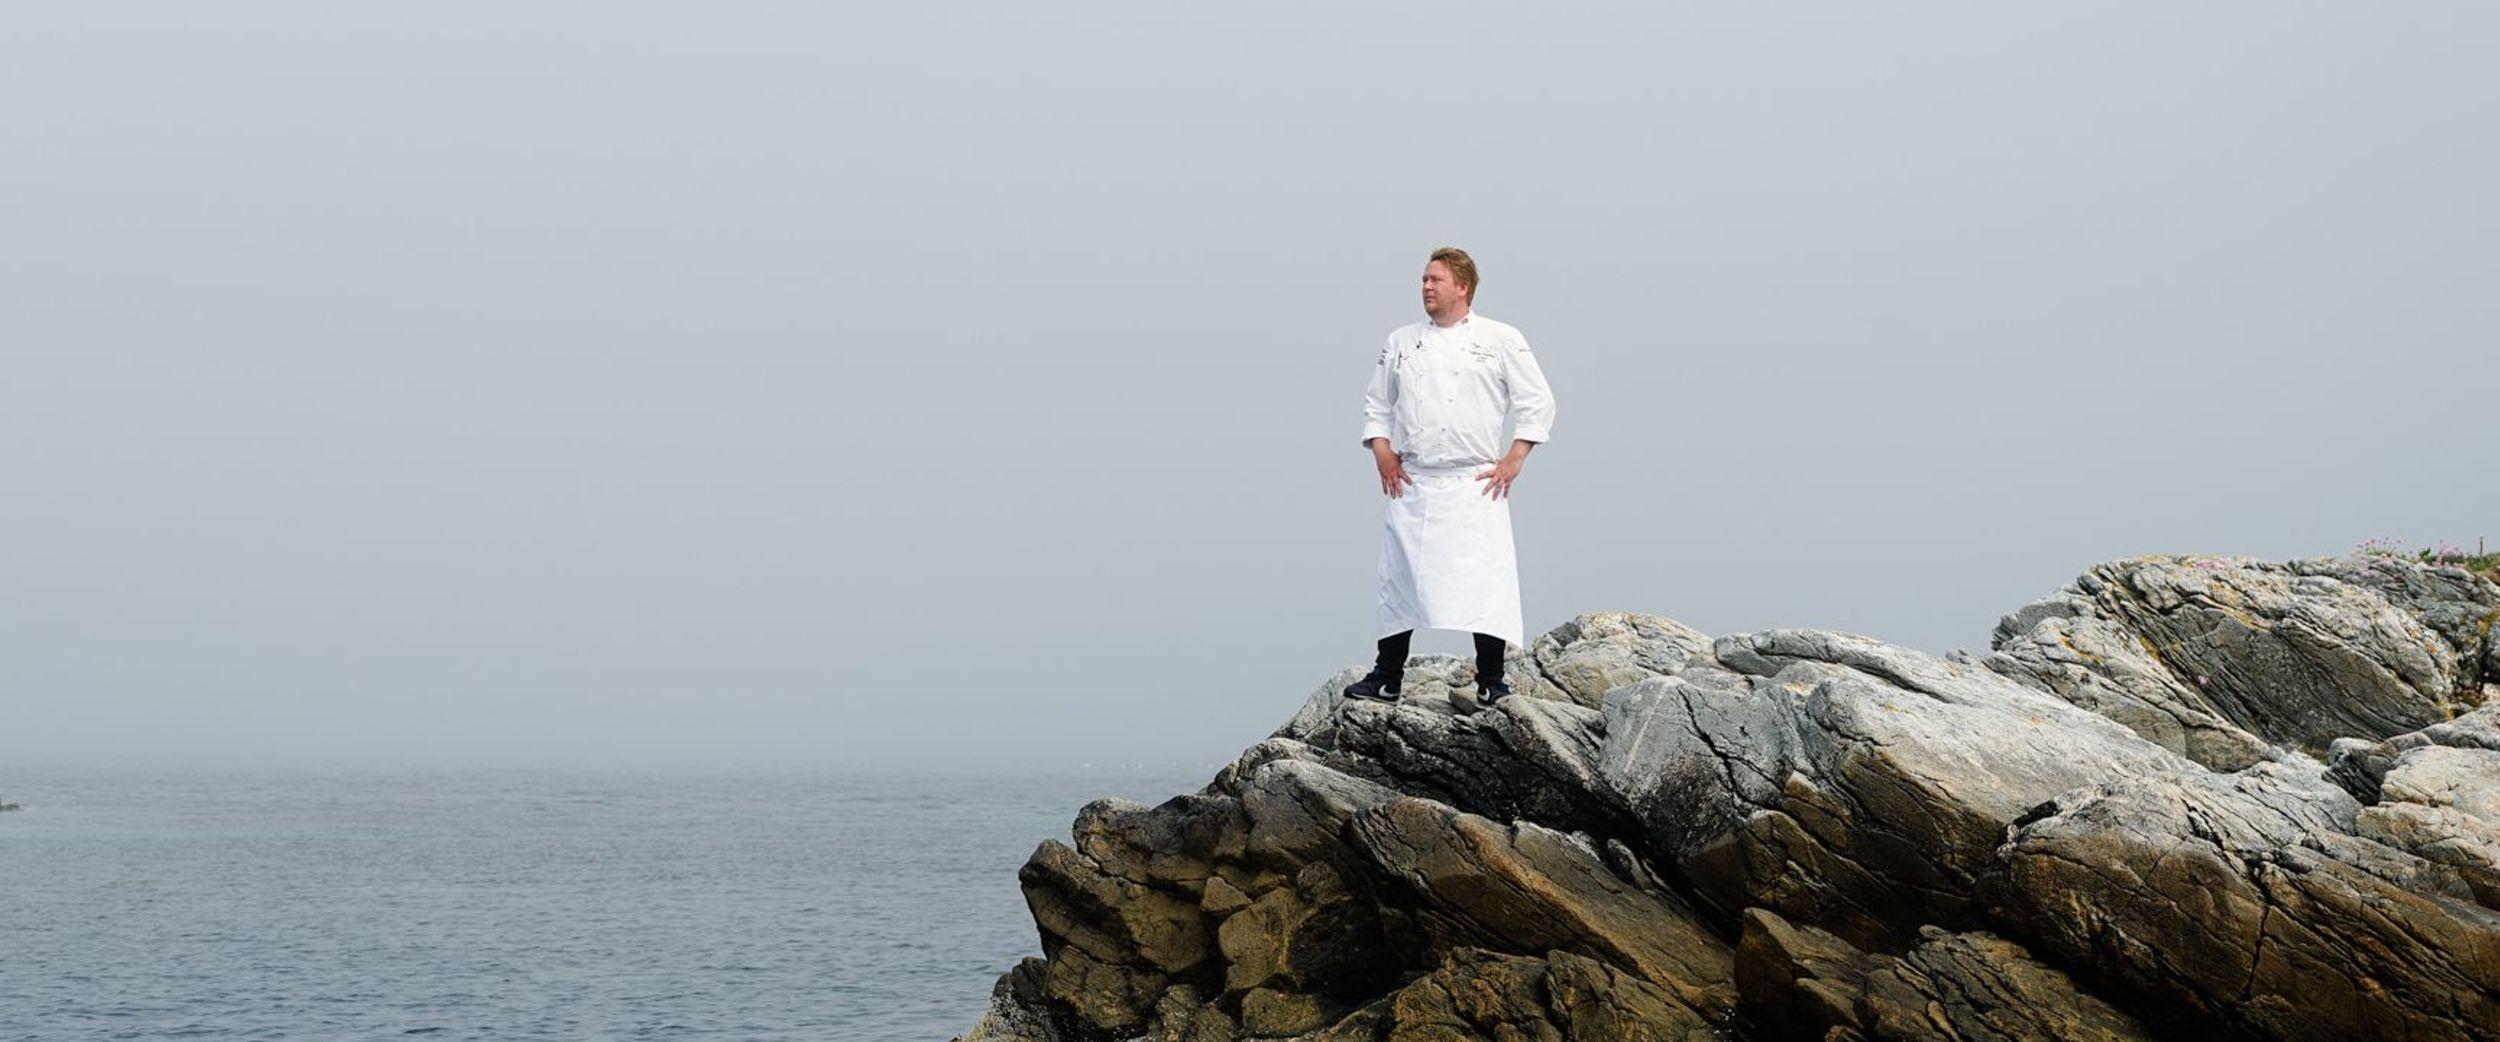 Gunnar Hvarnes by the ocean